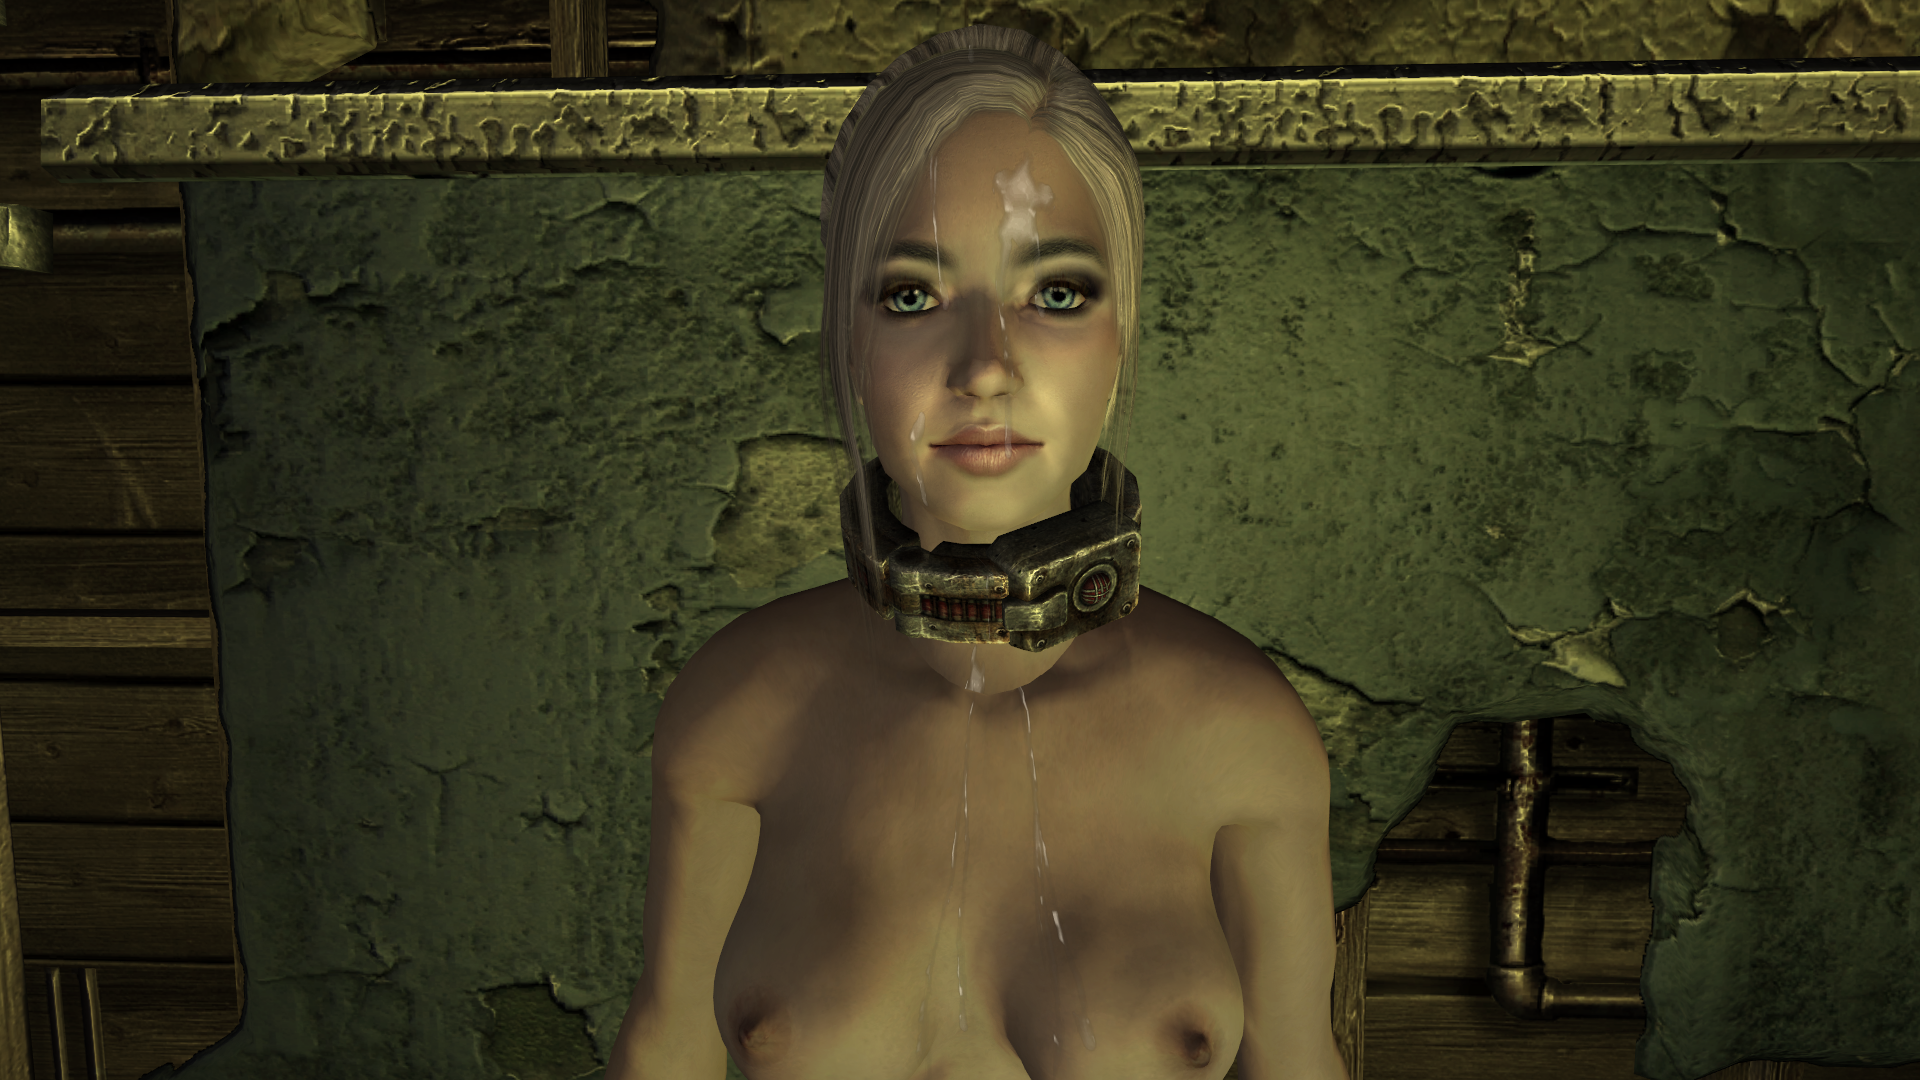 Fallout - New Vegas Screenshot 2018.10.25 - 20.26.20.78.png